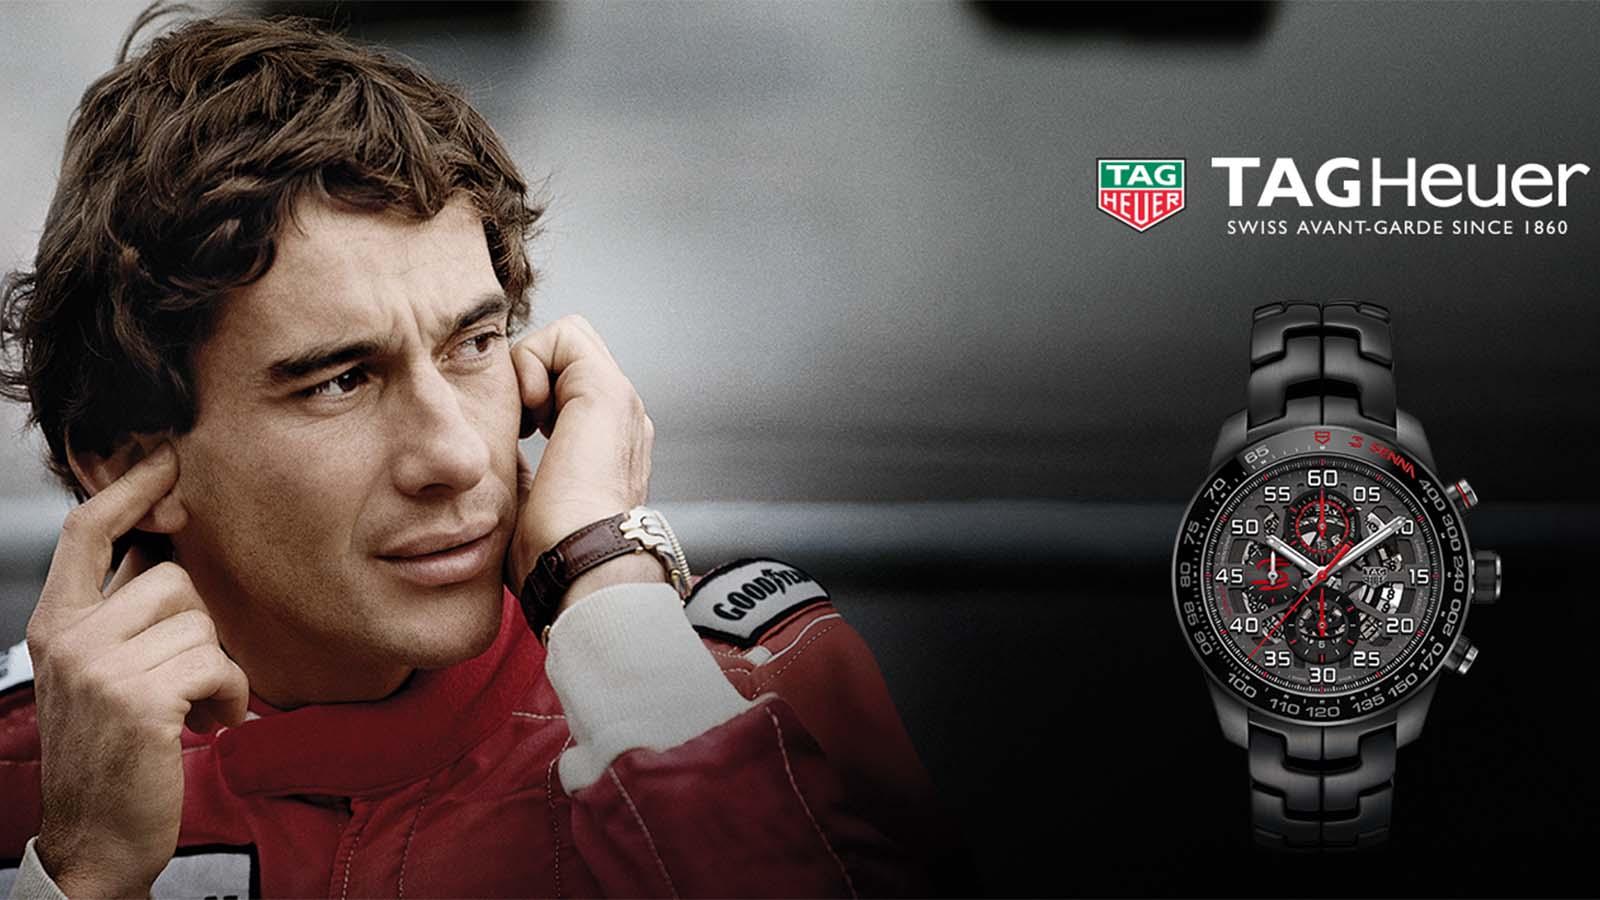 TAG Heuer Carrera Heuer-01 Ayrton Senna